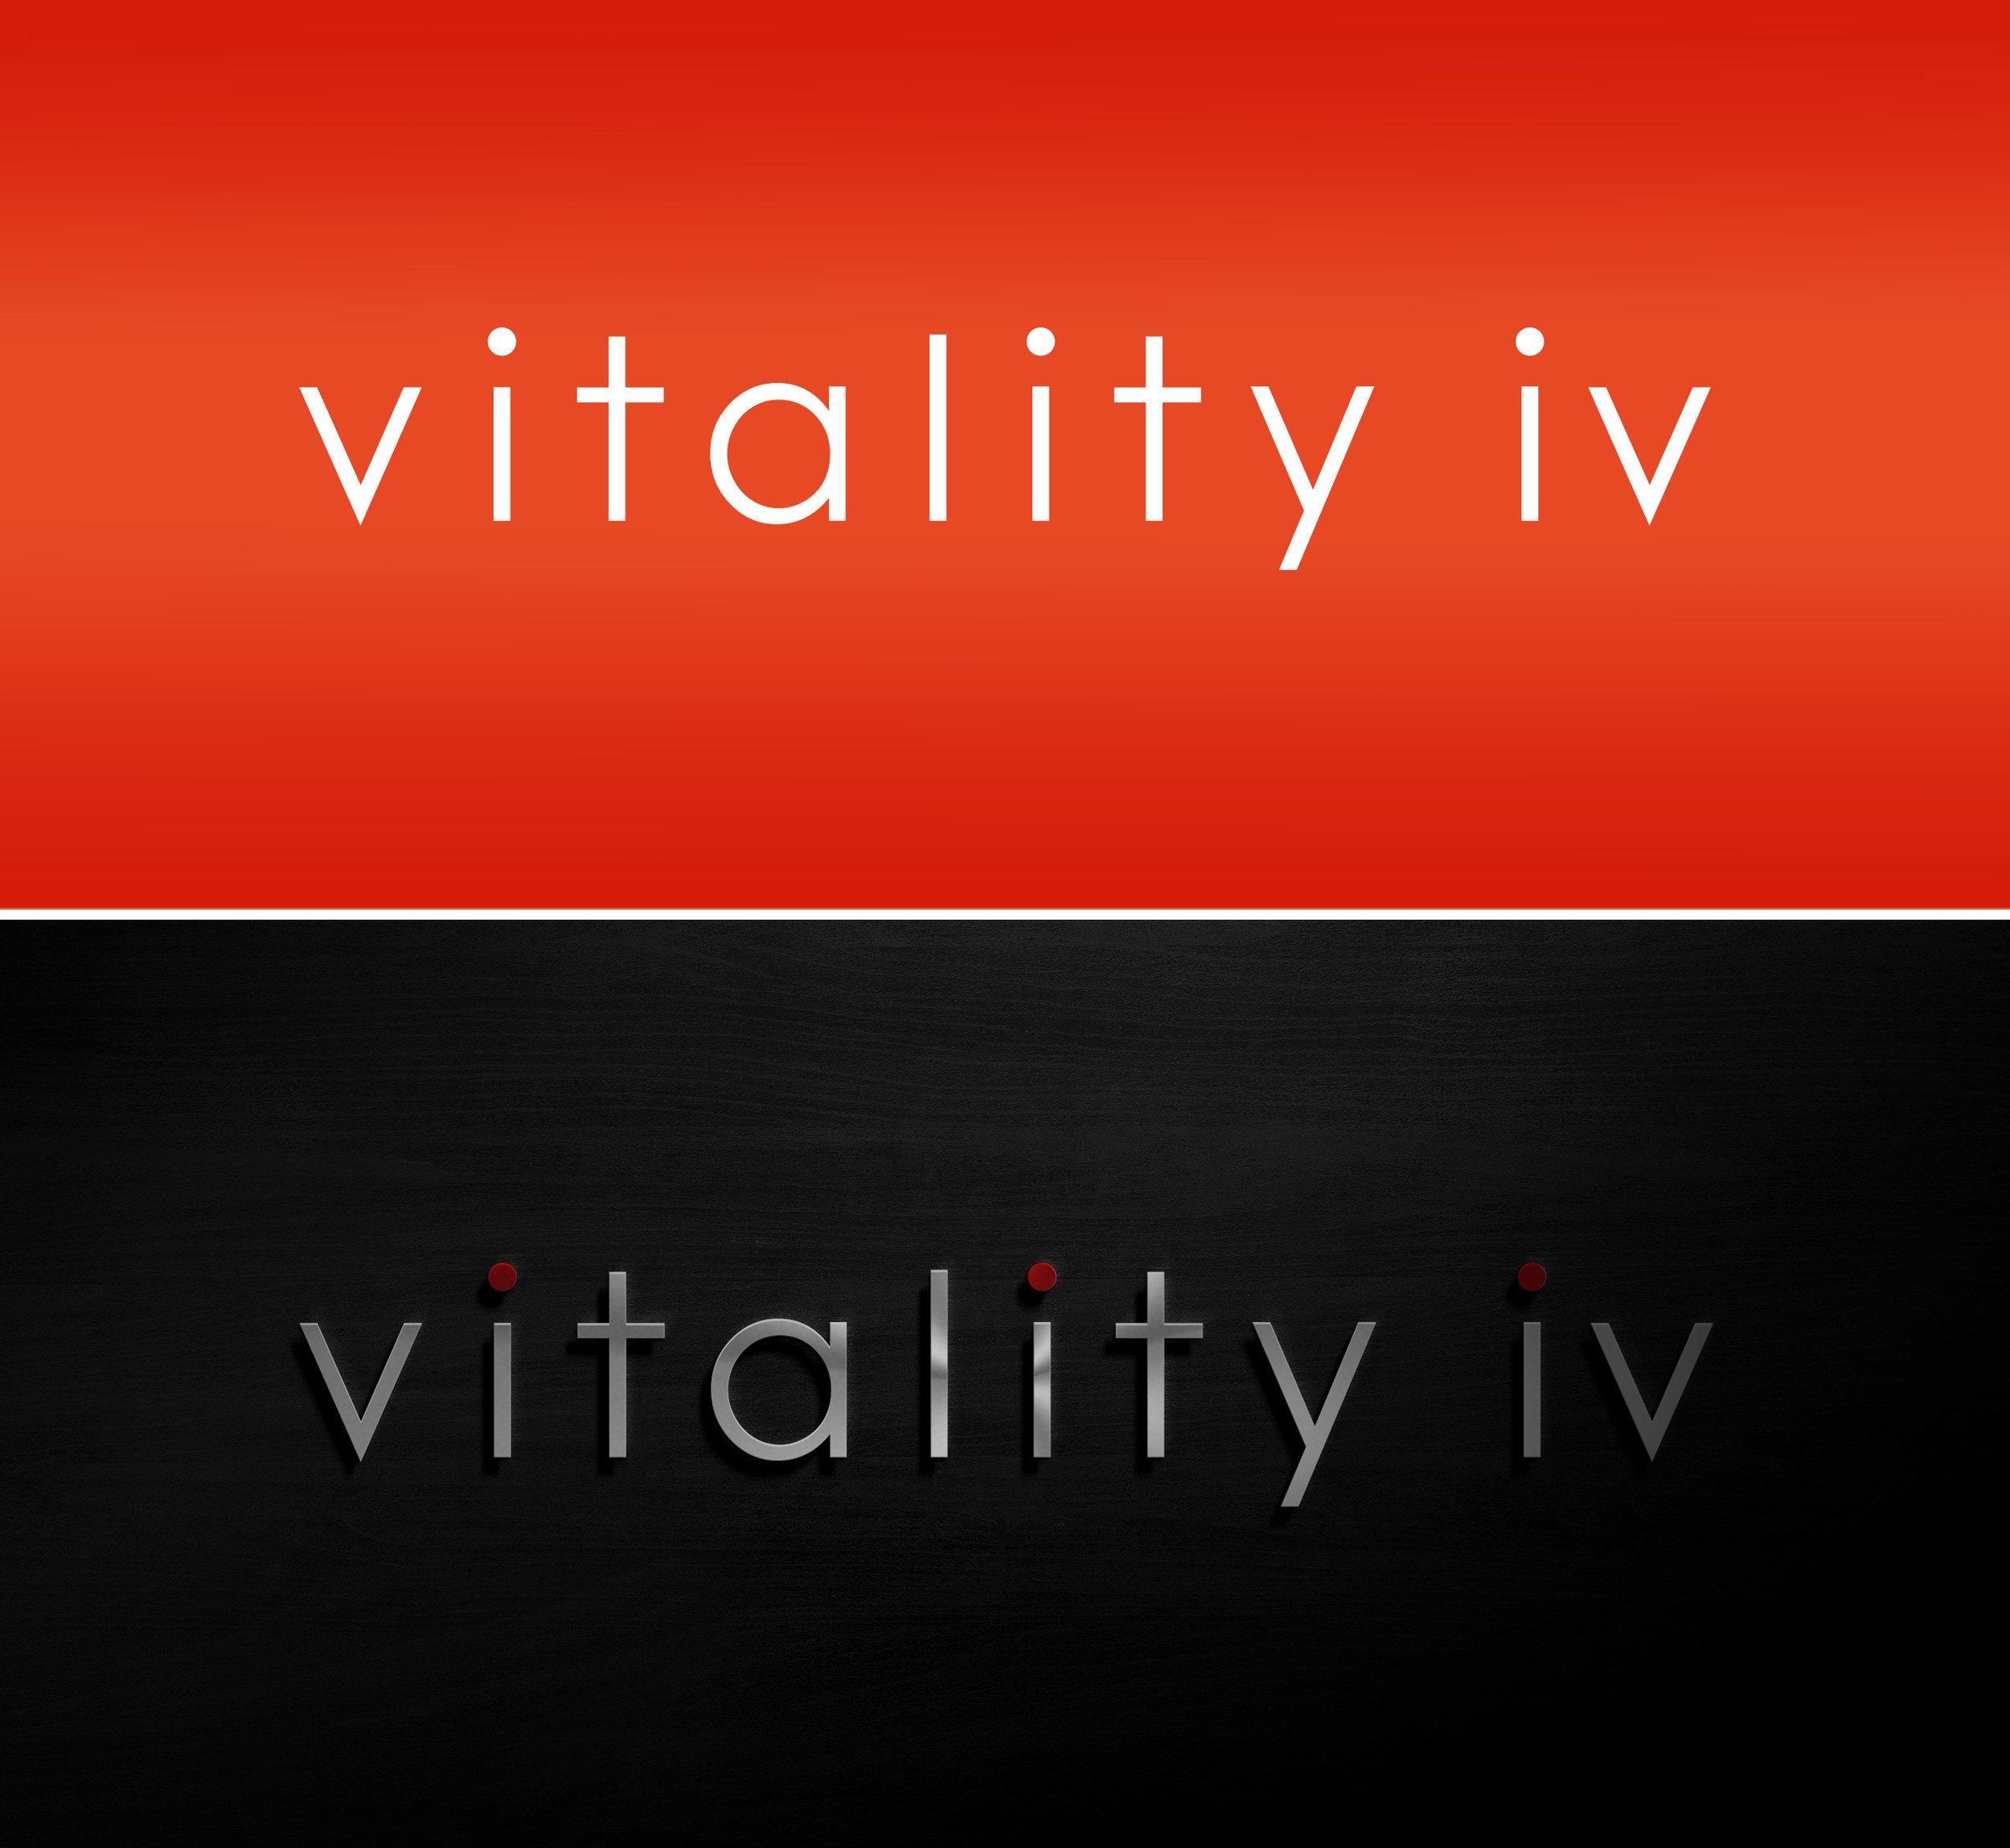 Vitality IV LogoType